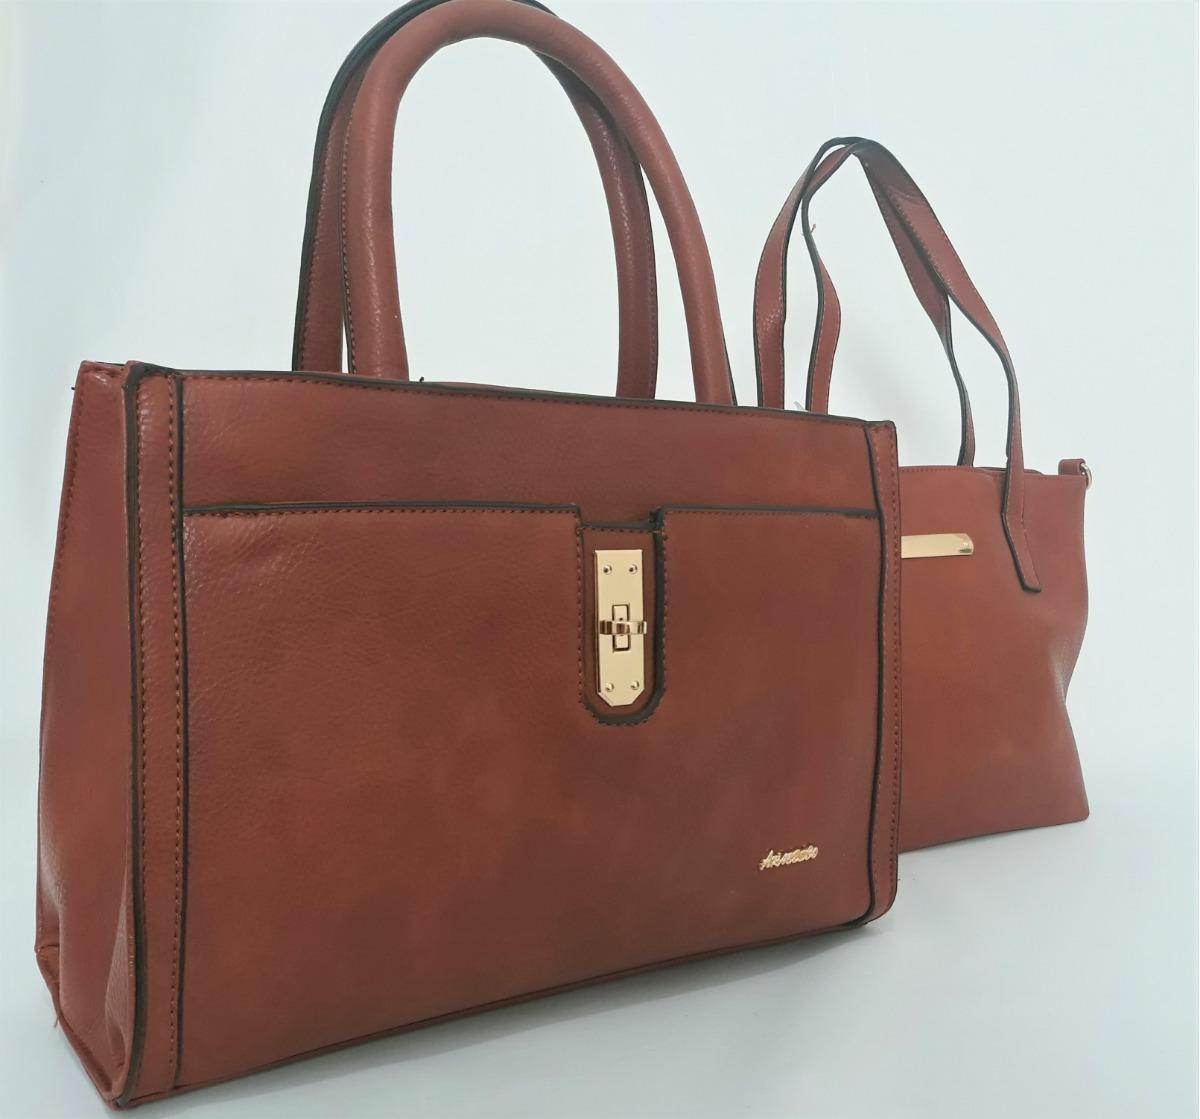 93da2f1ea bolsa feminina couro sintético kit 2 bolsas envio 24h marrom. Carregando  zoom.